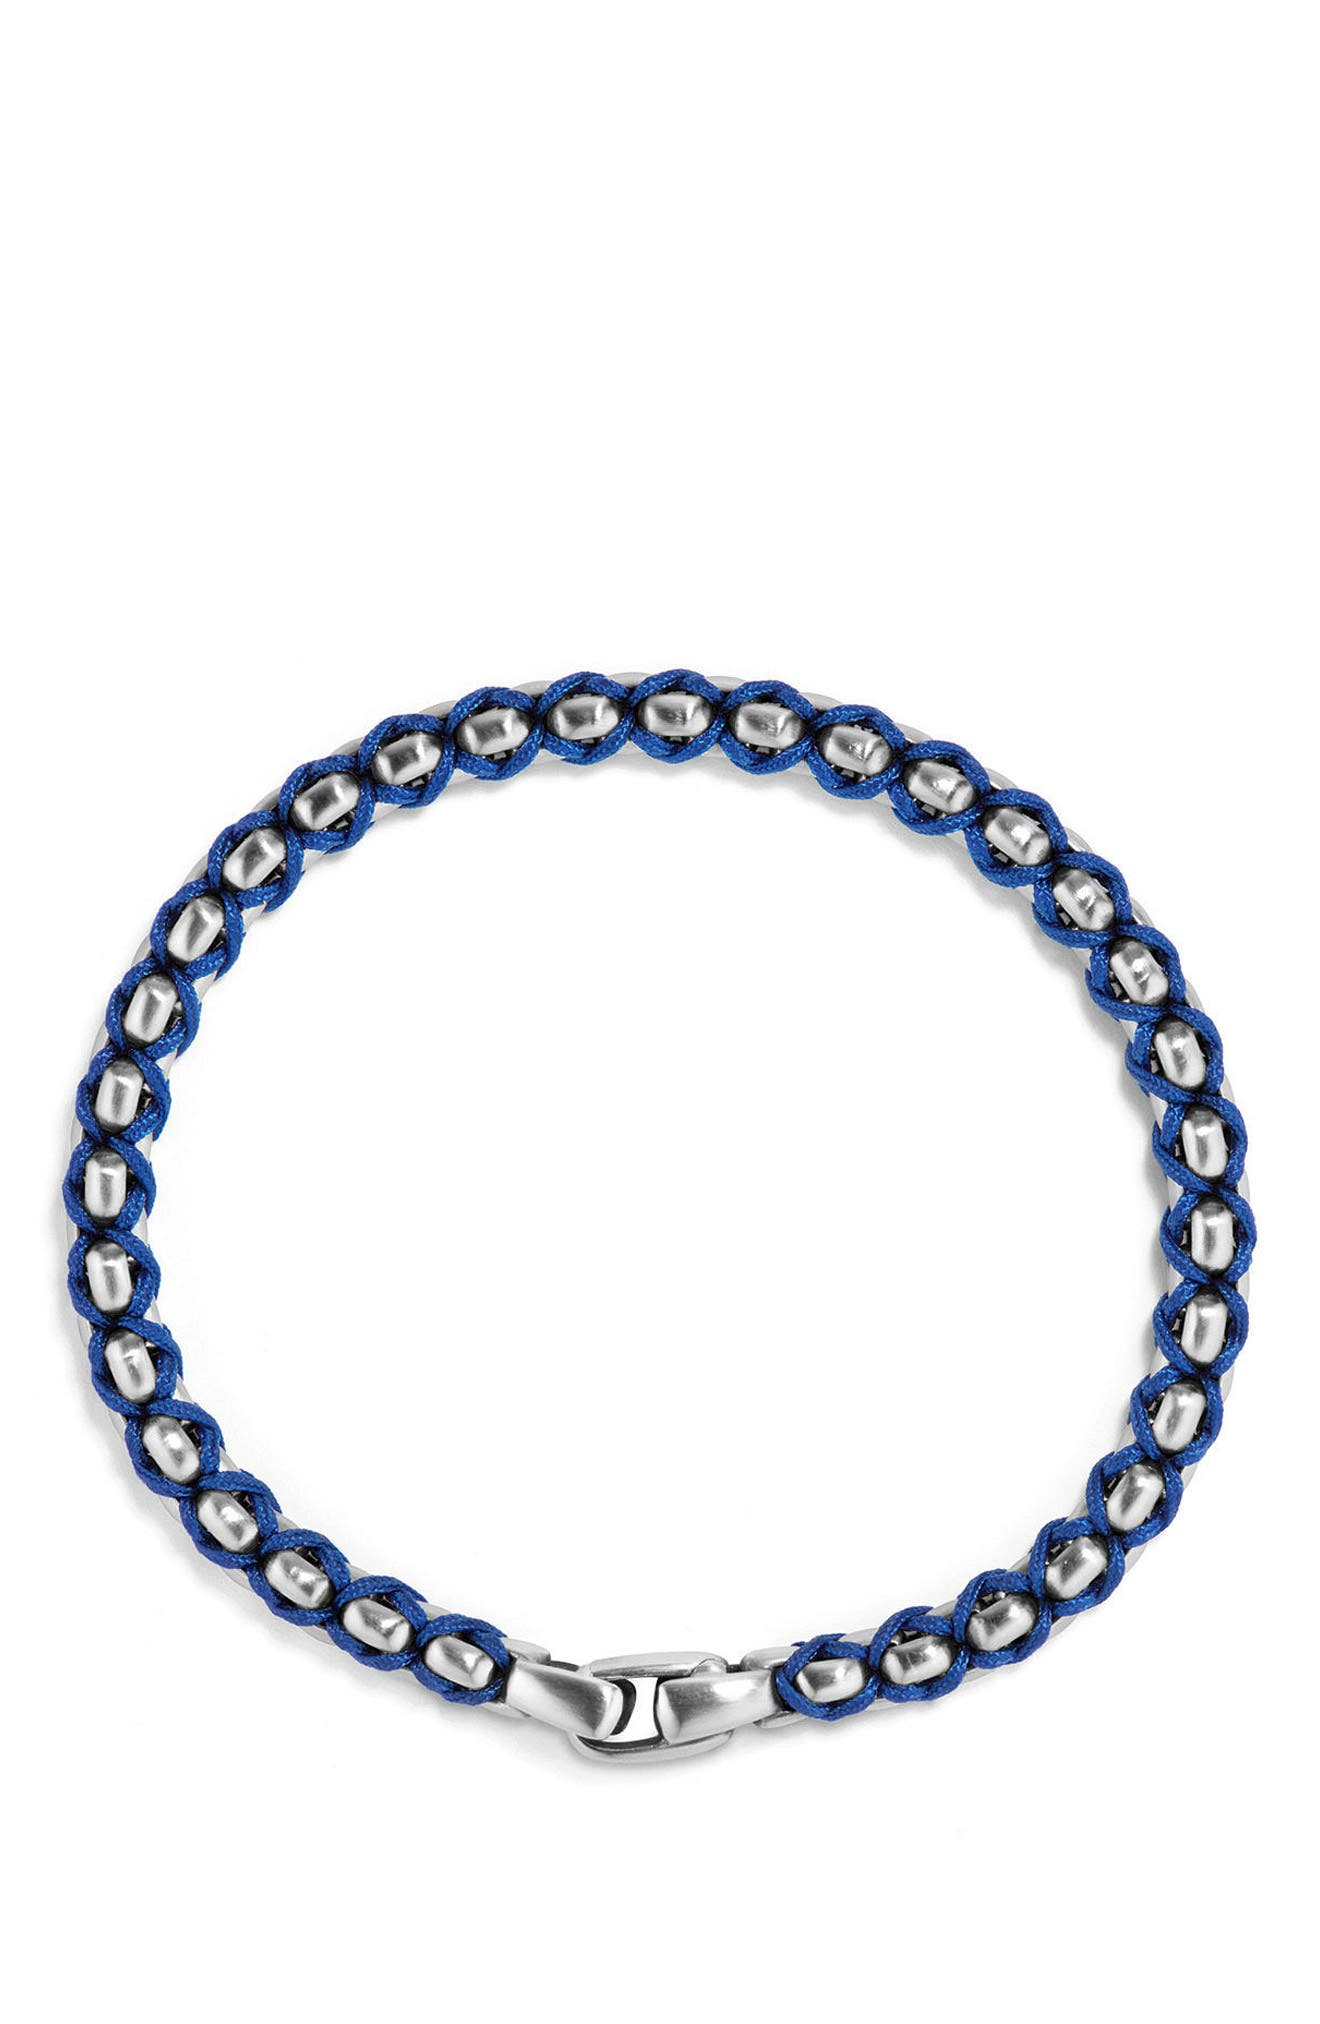 Chain Woven Bracelet,                             Alternate thumbnail 2, color,                             041